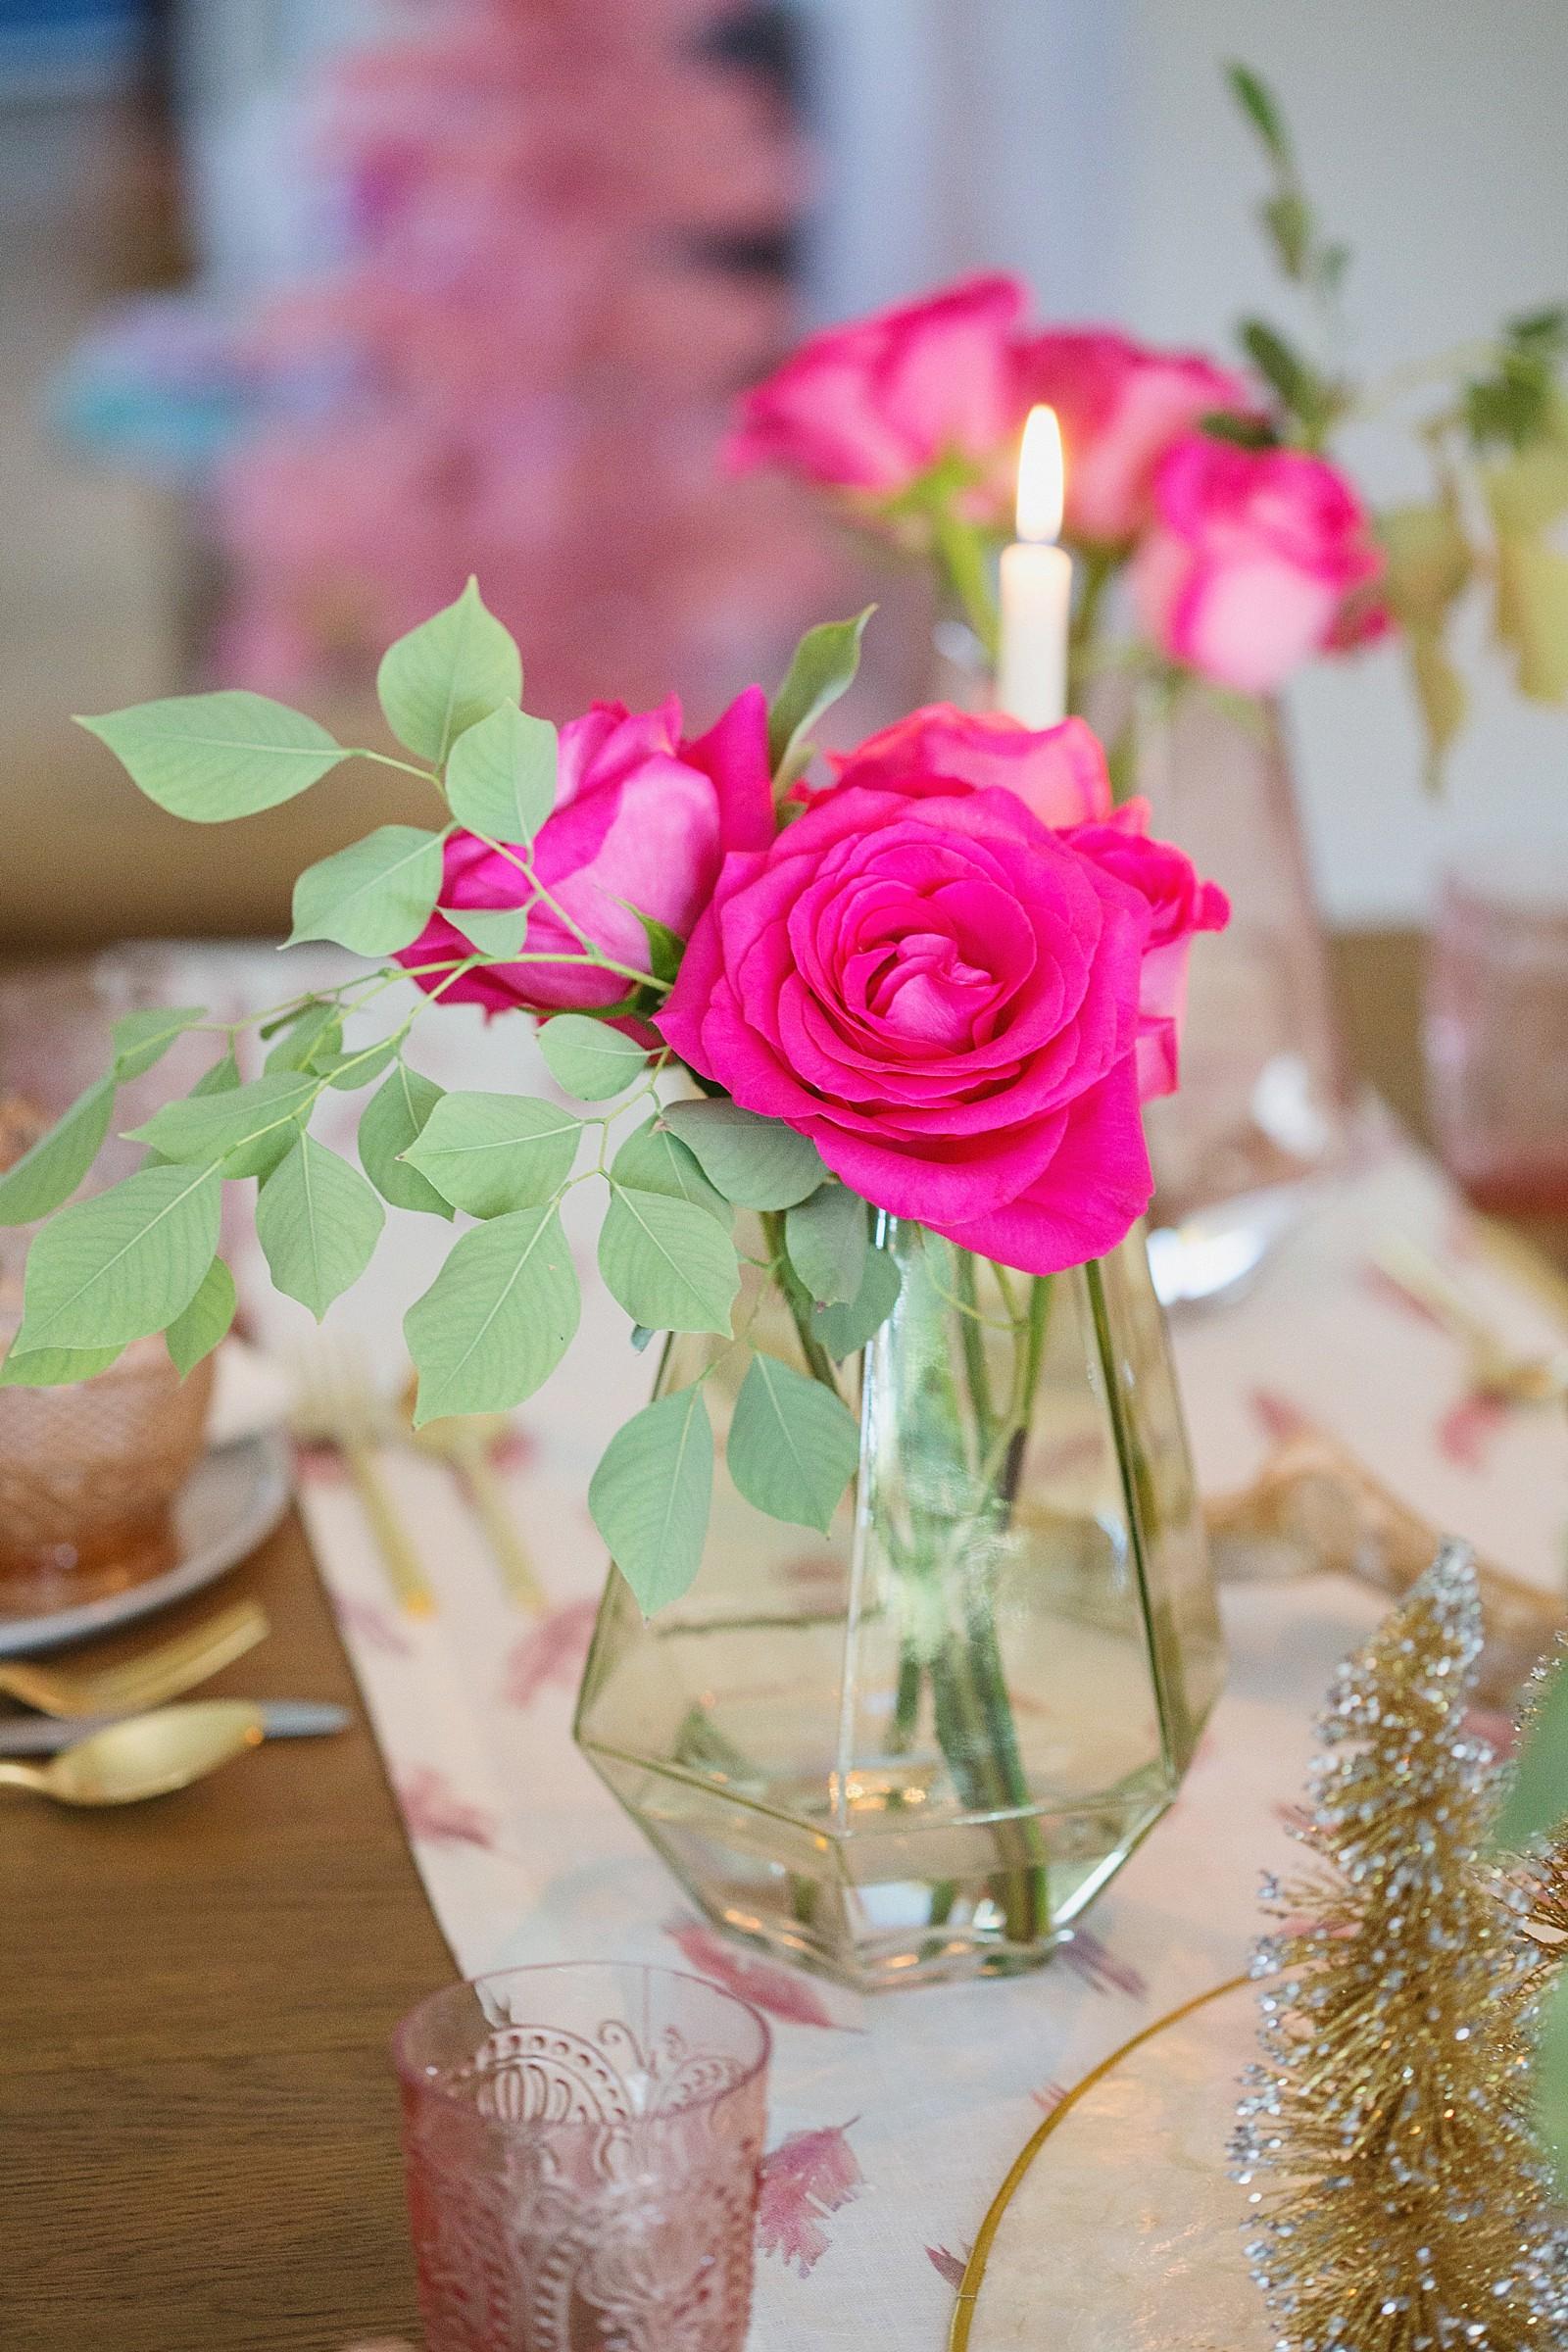 minted-christmas-inspiration-girls-party-photos-diana-elizabeth-blog-lifestyle-hostess-entertainment-home-blog-2294